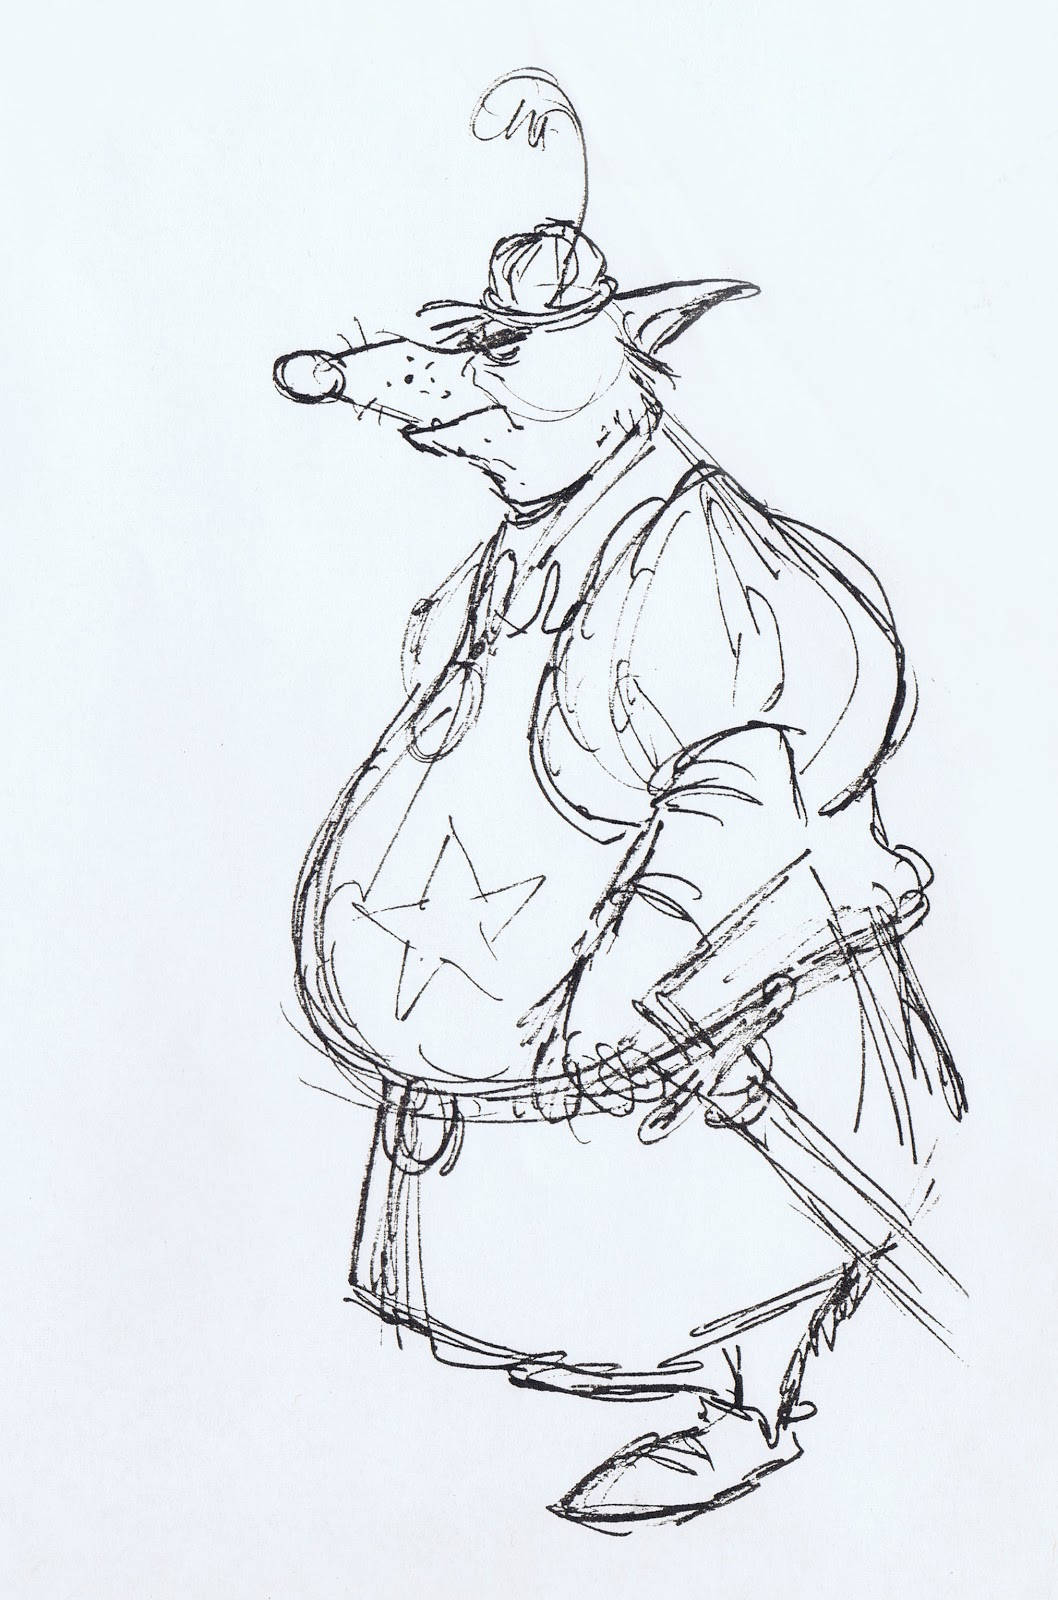 Deja View: The Sheriff of Nottingham